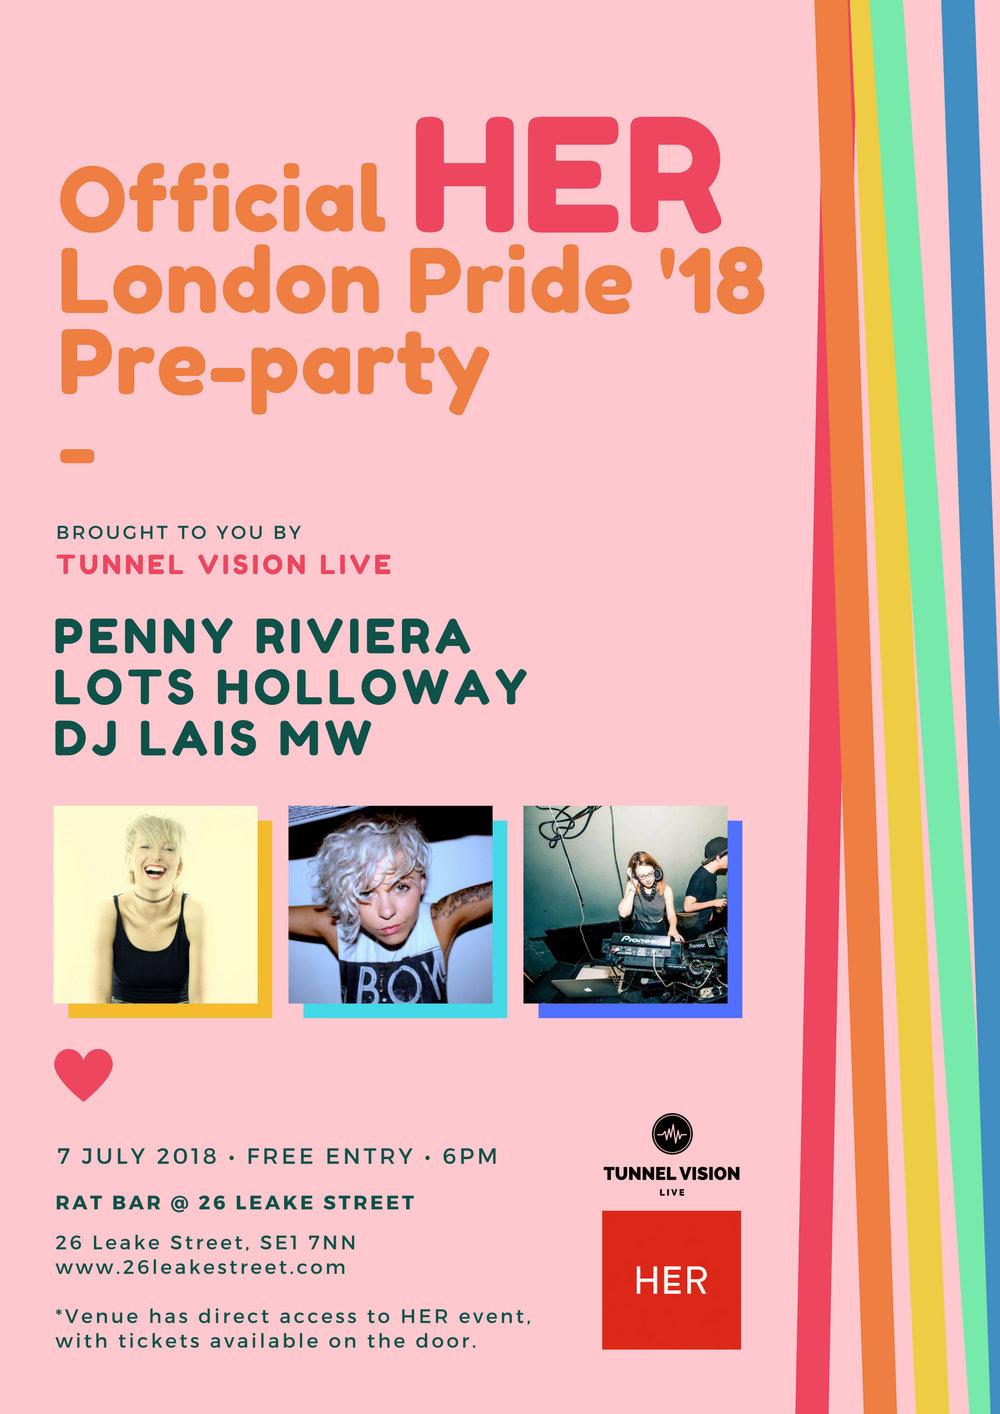 OfficialLondon Pride '18Pre-party Final.jpg